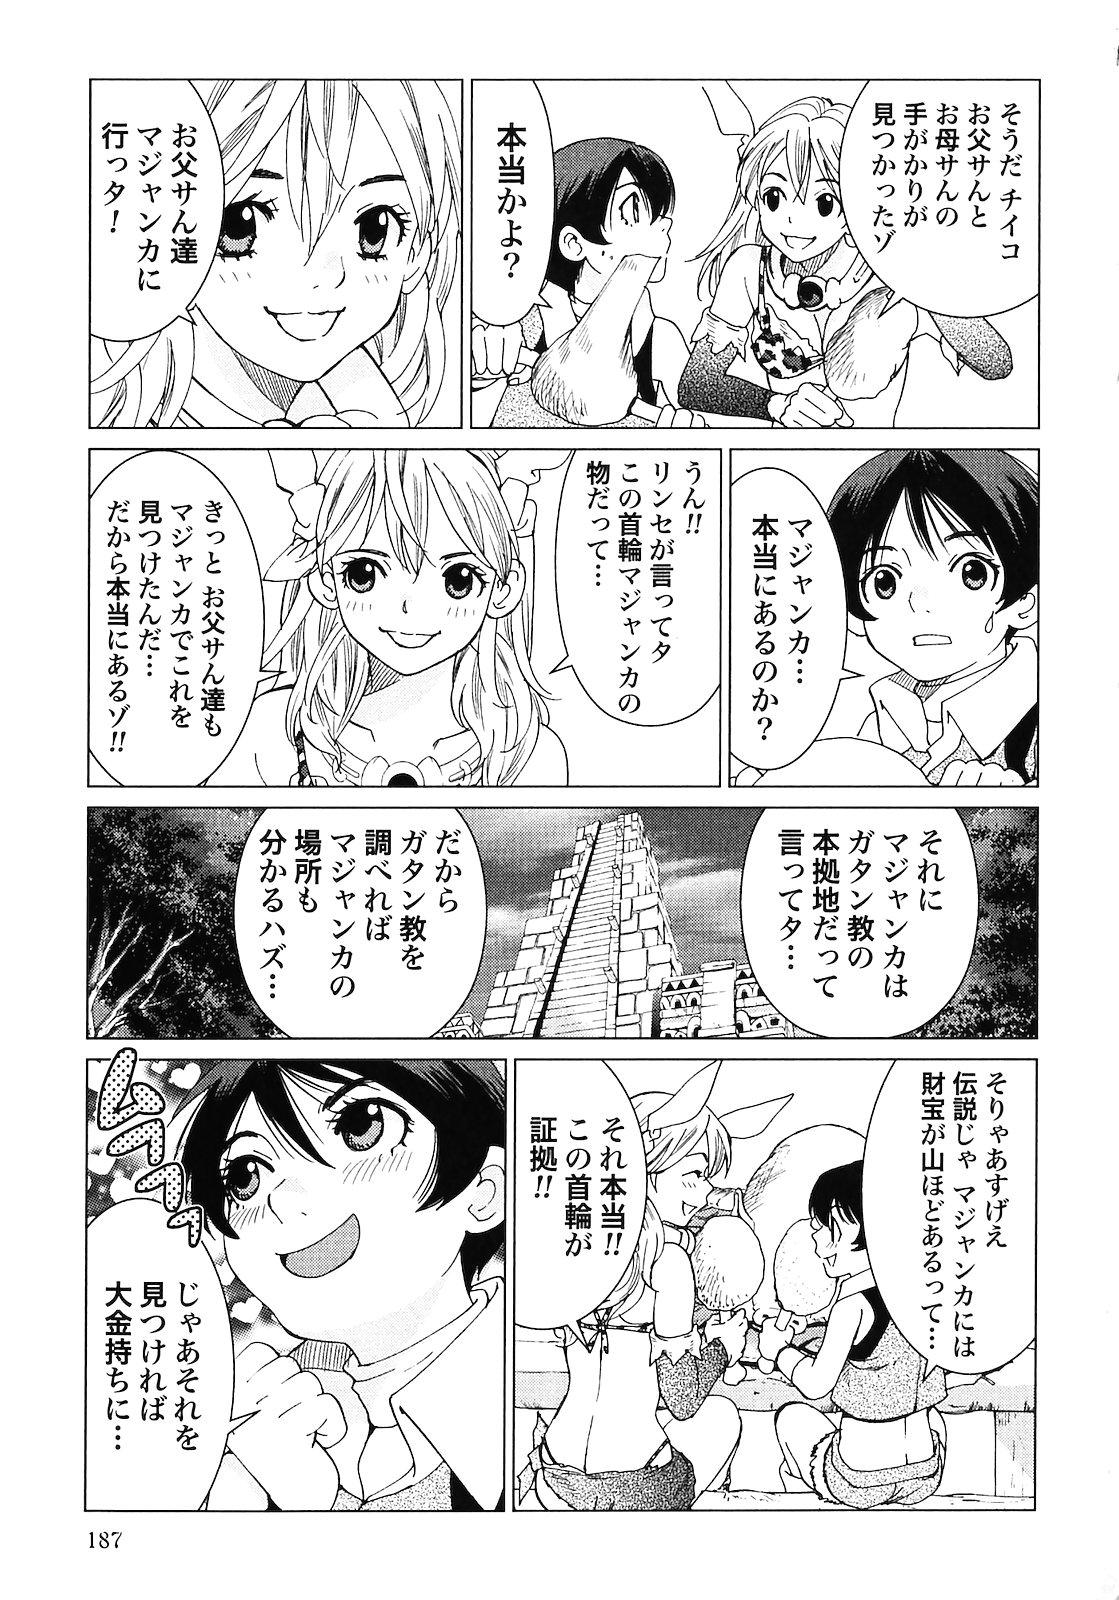 Makyo no Shanana Vol.02 188